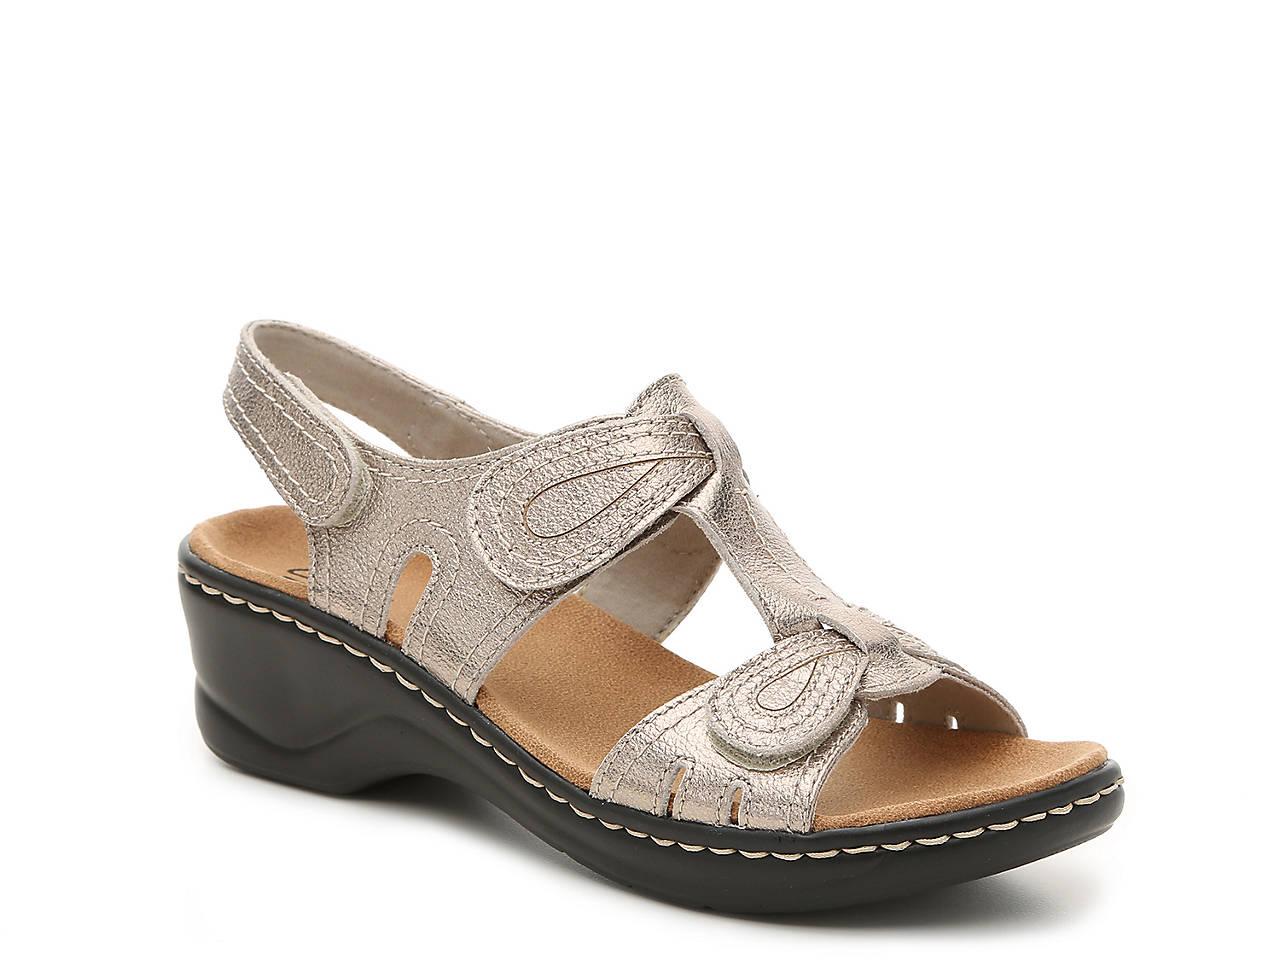 Clarks Lexi Walnut Wedge Sandal Women s Shoes